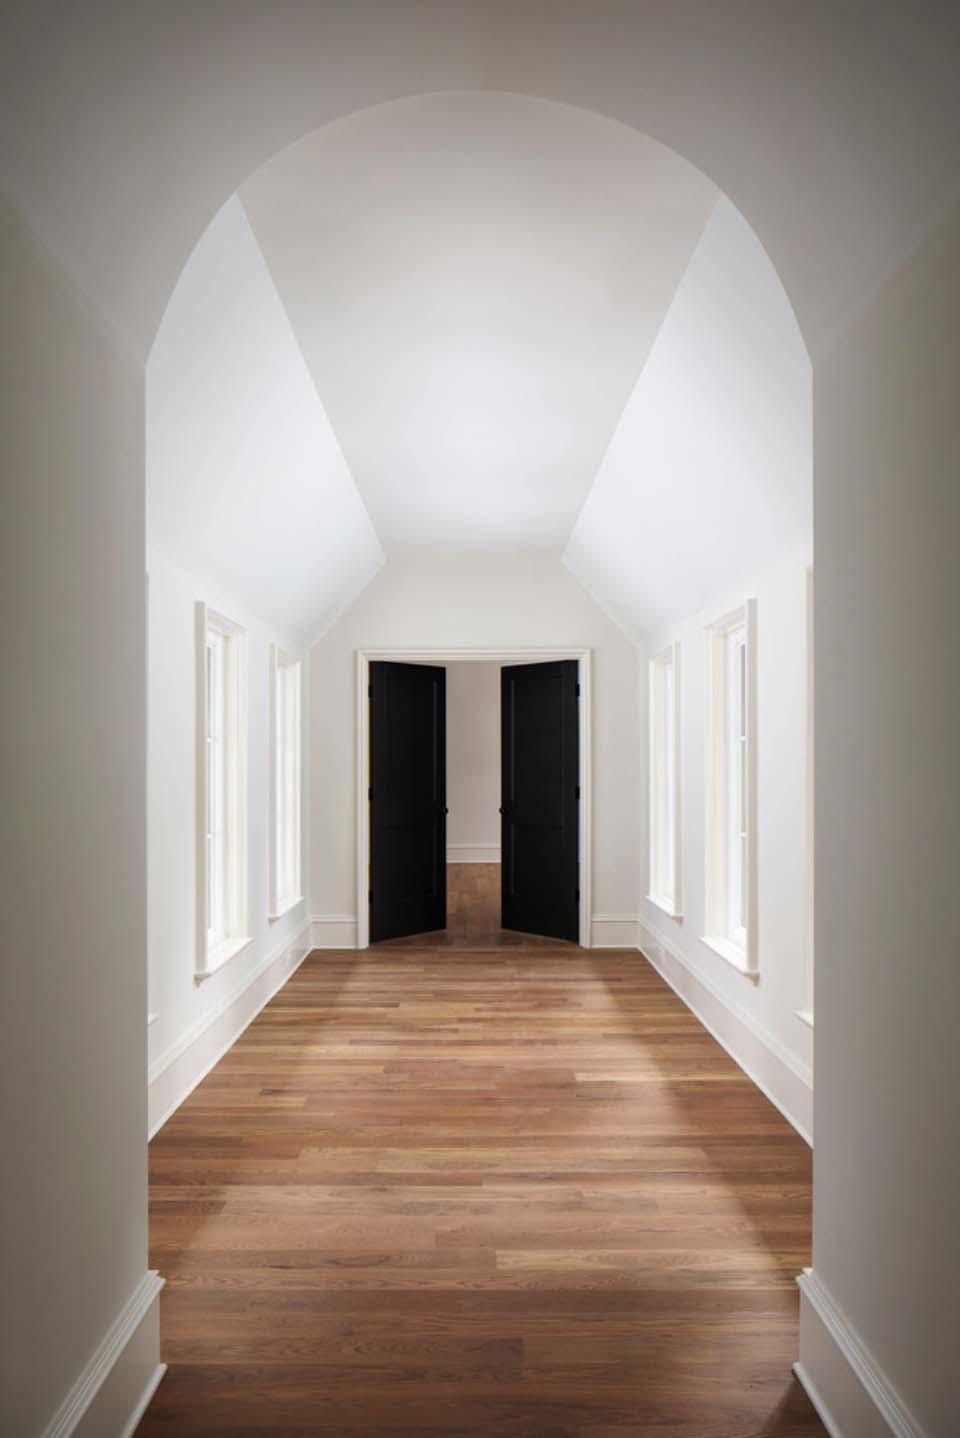 catwalk-transitional-hall